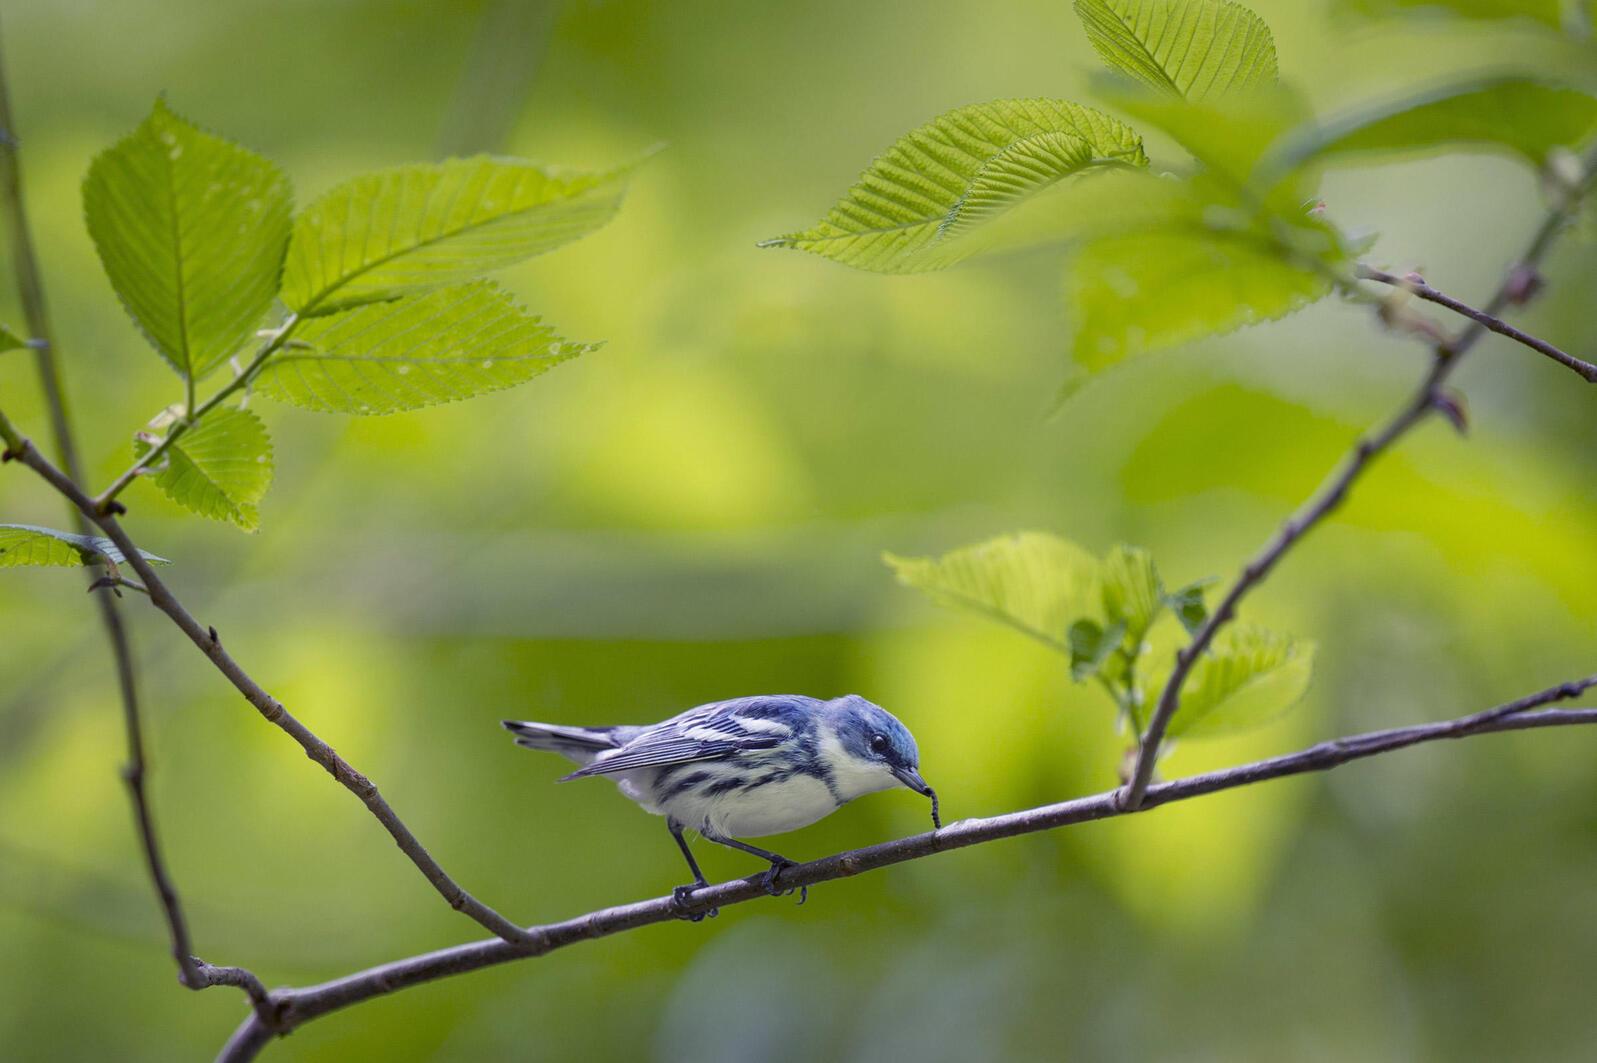 Cerulean Warbler. Ray Hennessy/Shutterstock